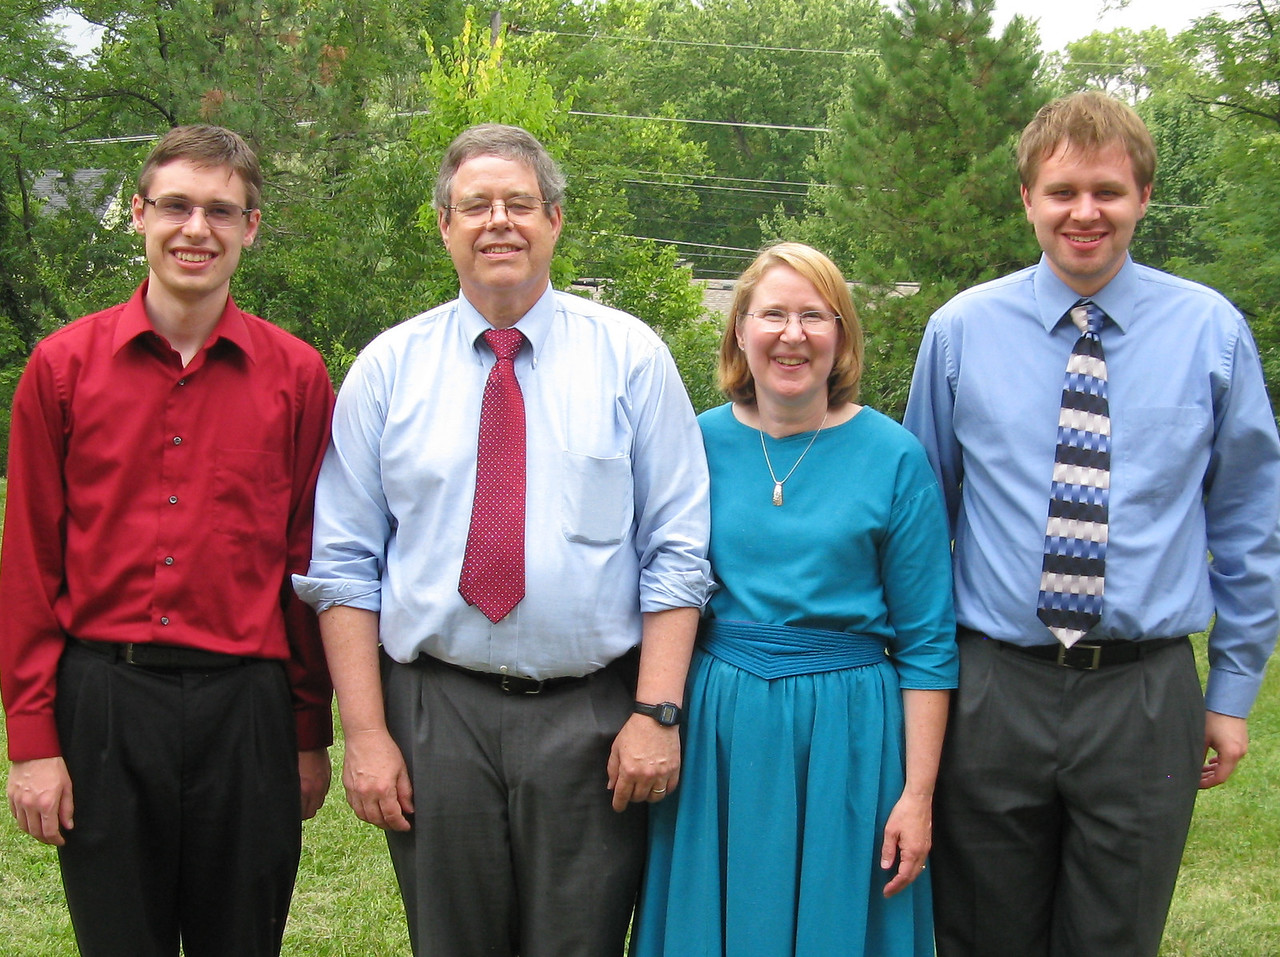 Kevin, Martin, Mary and Nathan.